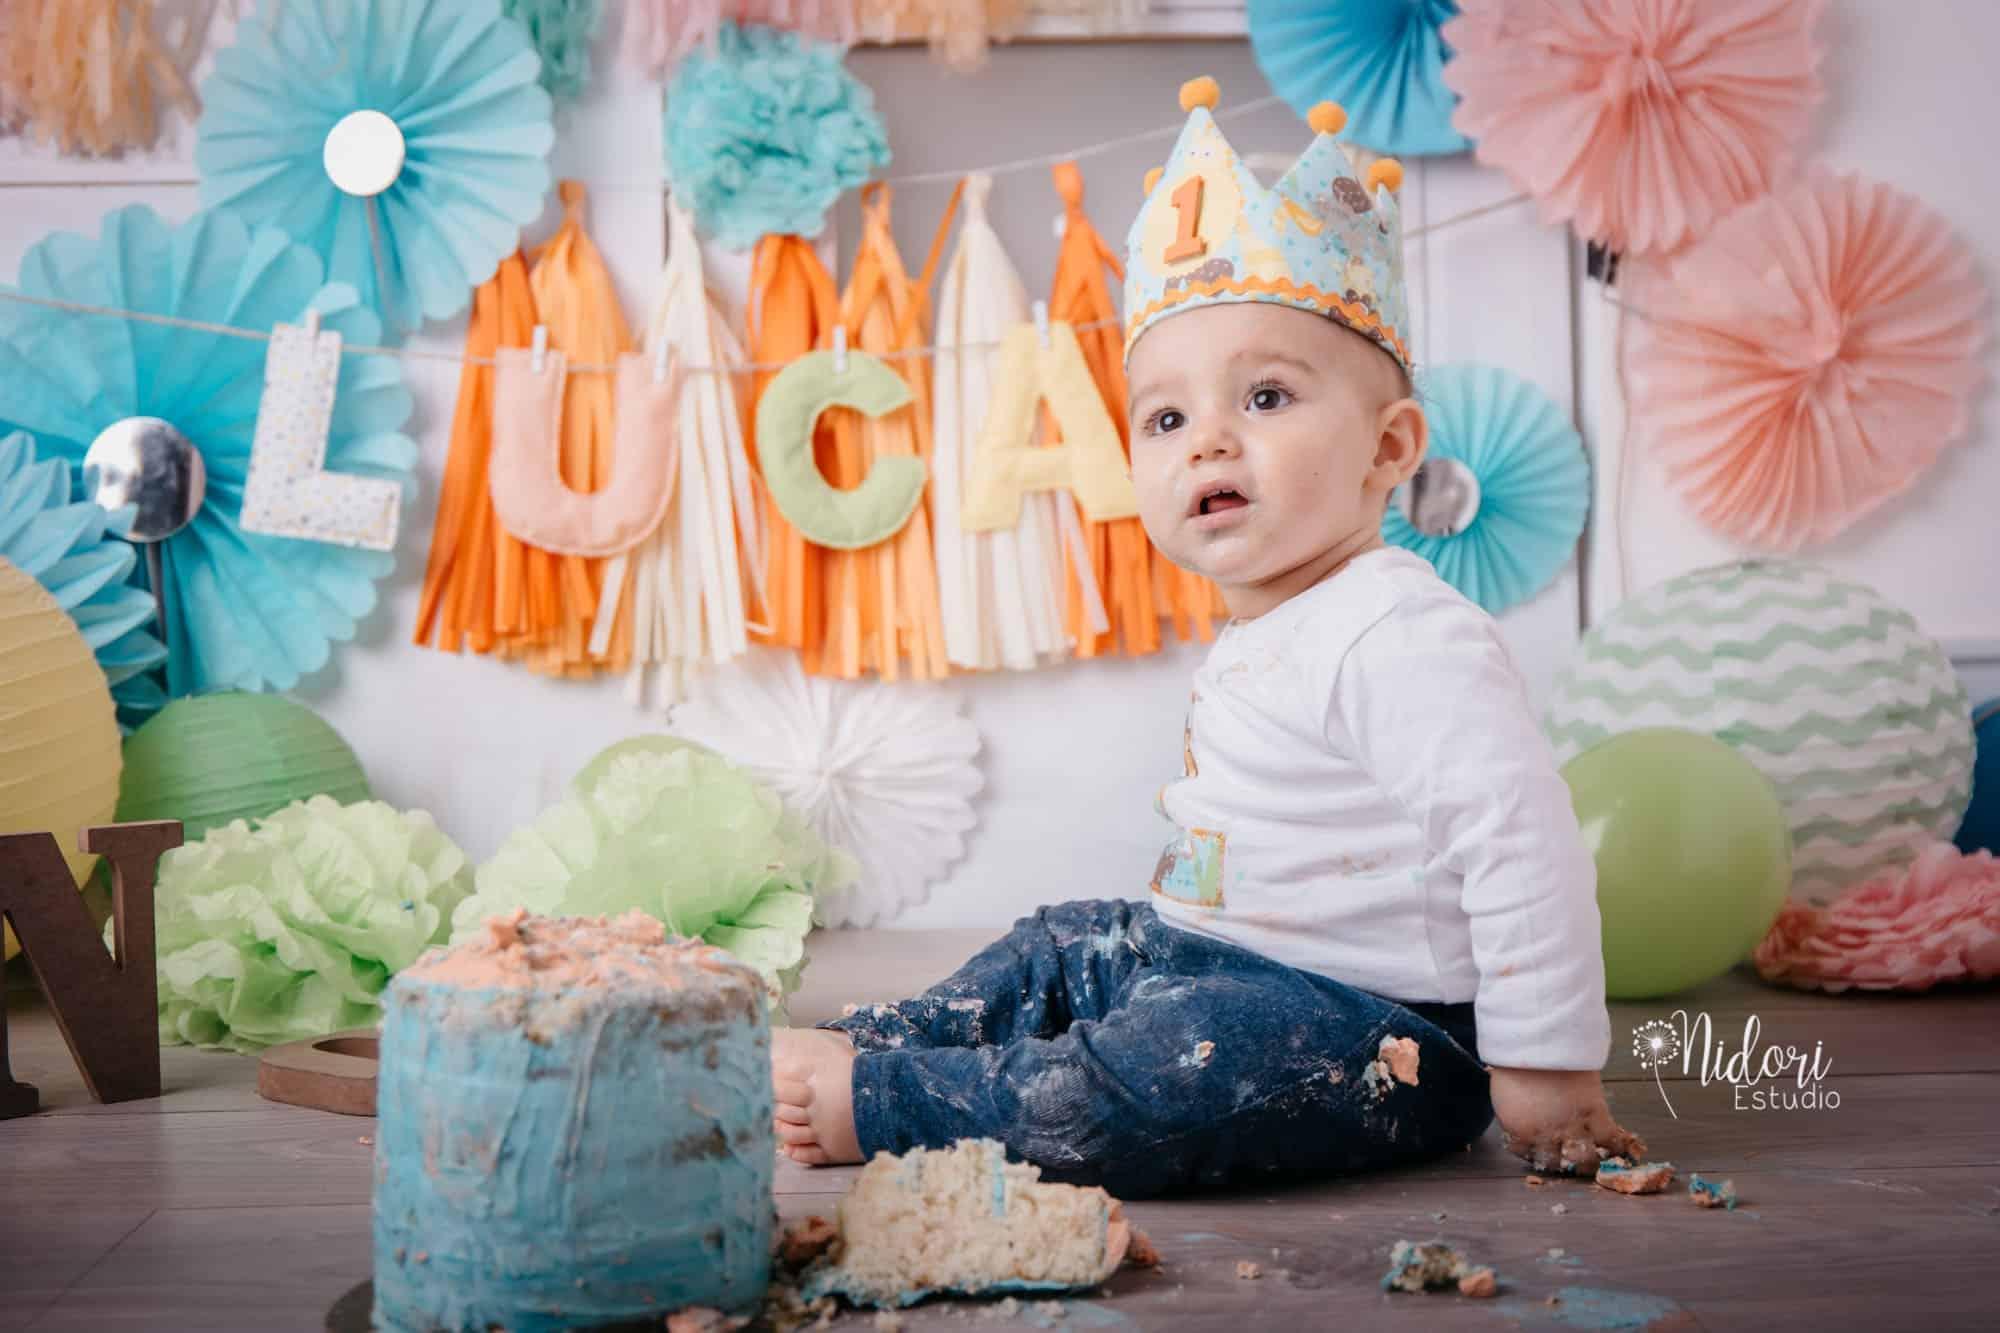 smash-cake-cumpleaños-tarta-fotografia-niños-bebes-nidoriestudio-fotos-valencia-almazora-castellon-españa-spain-18